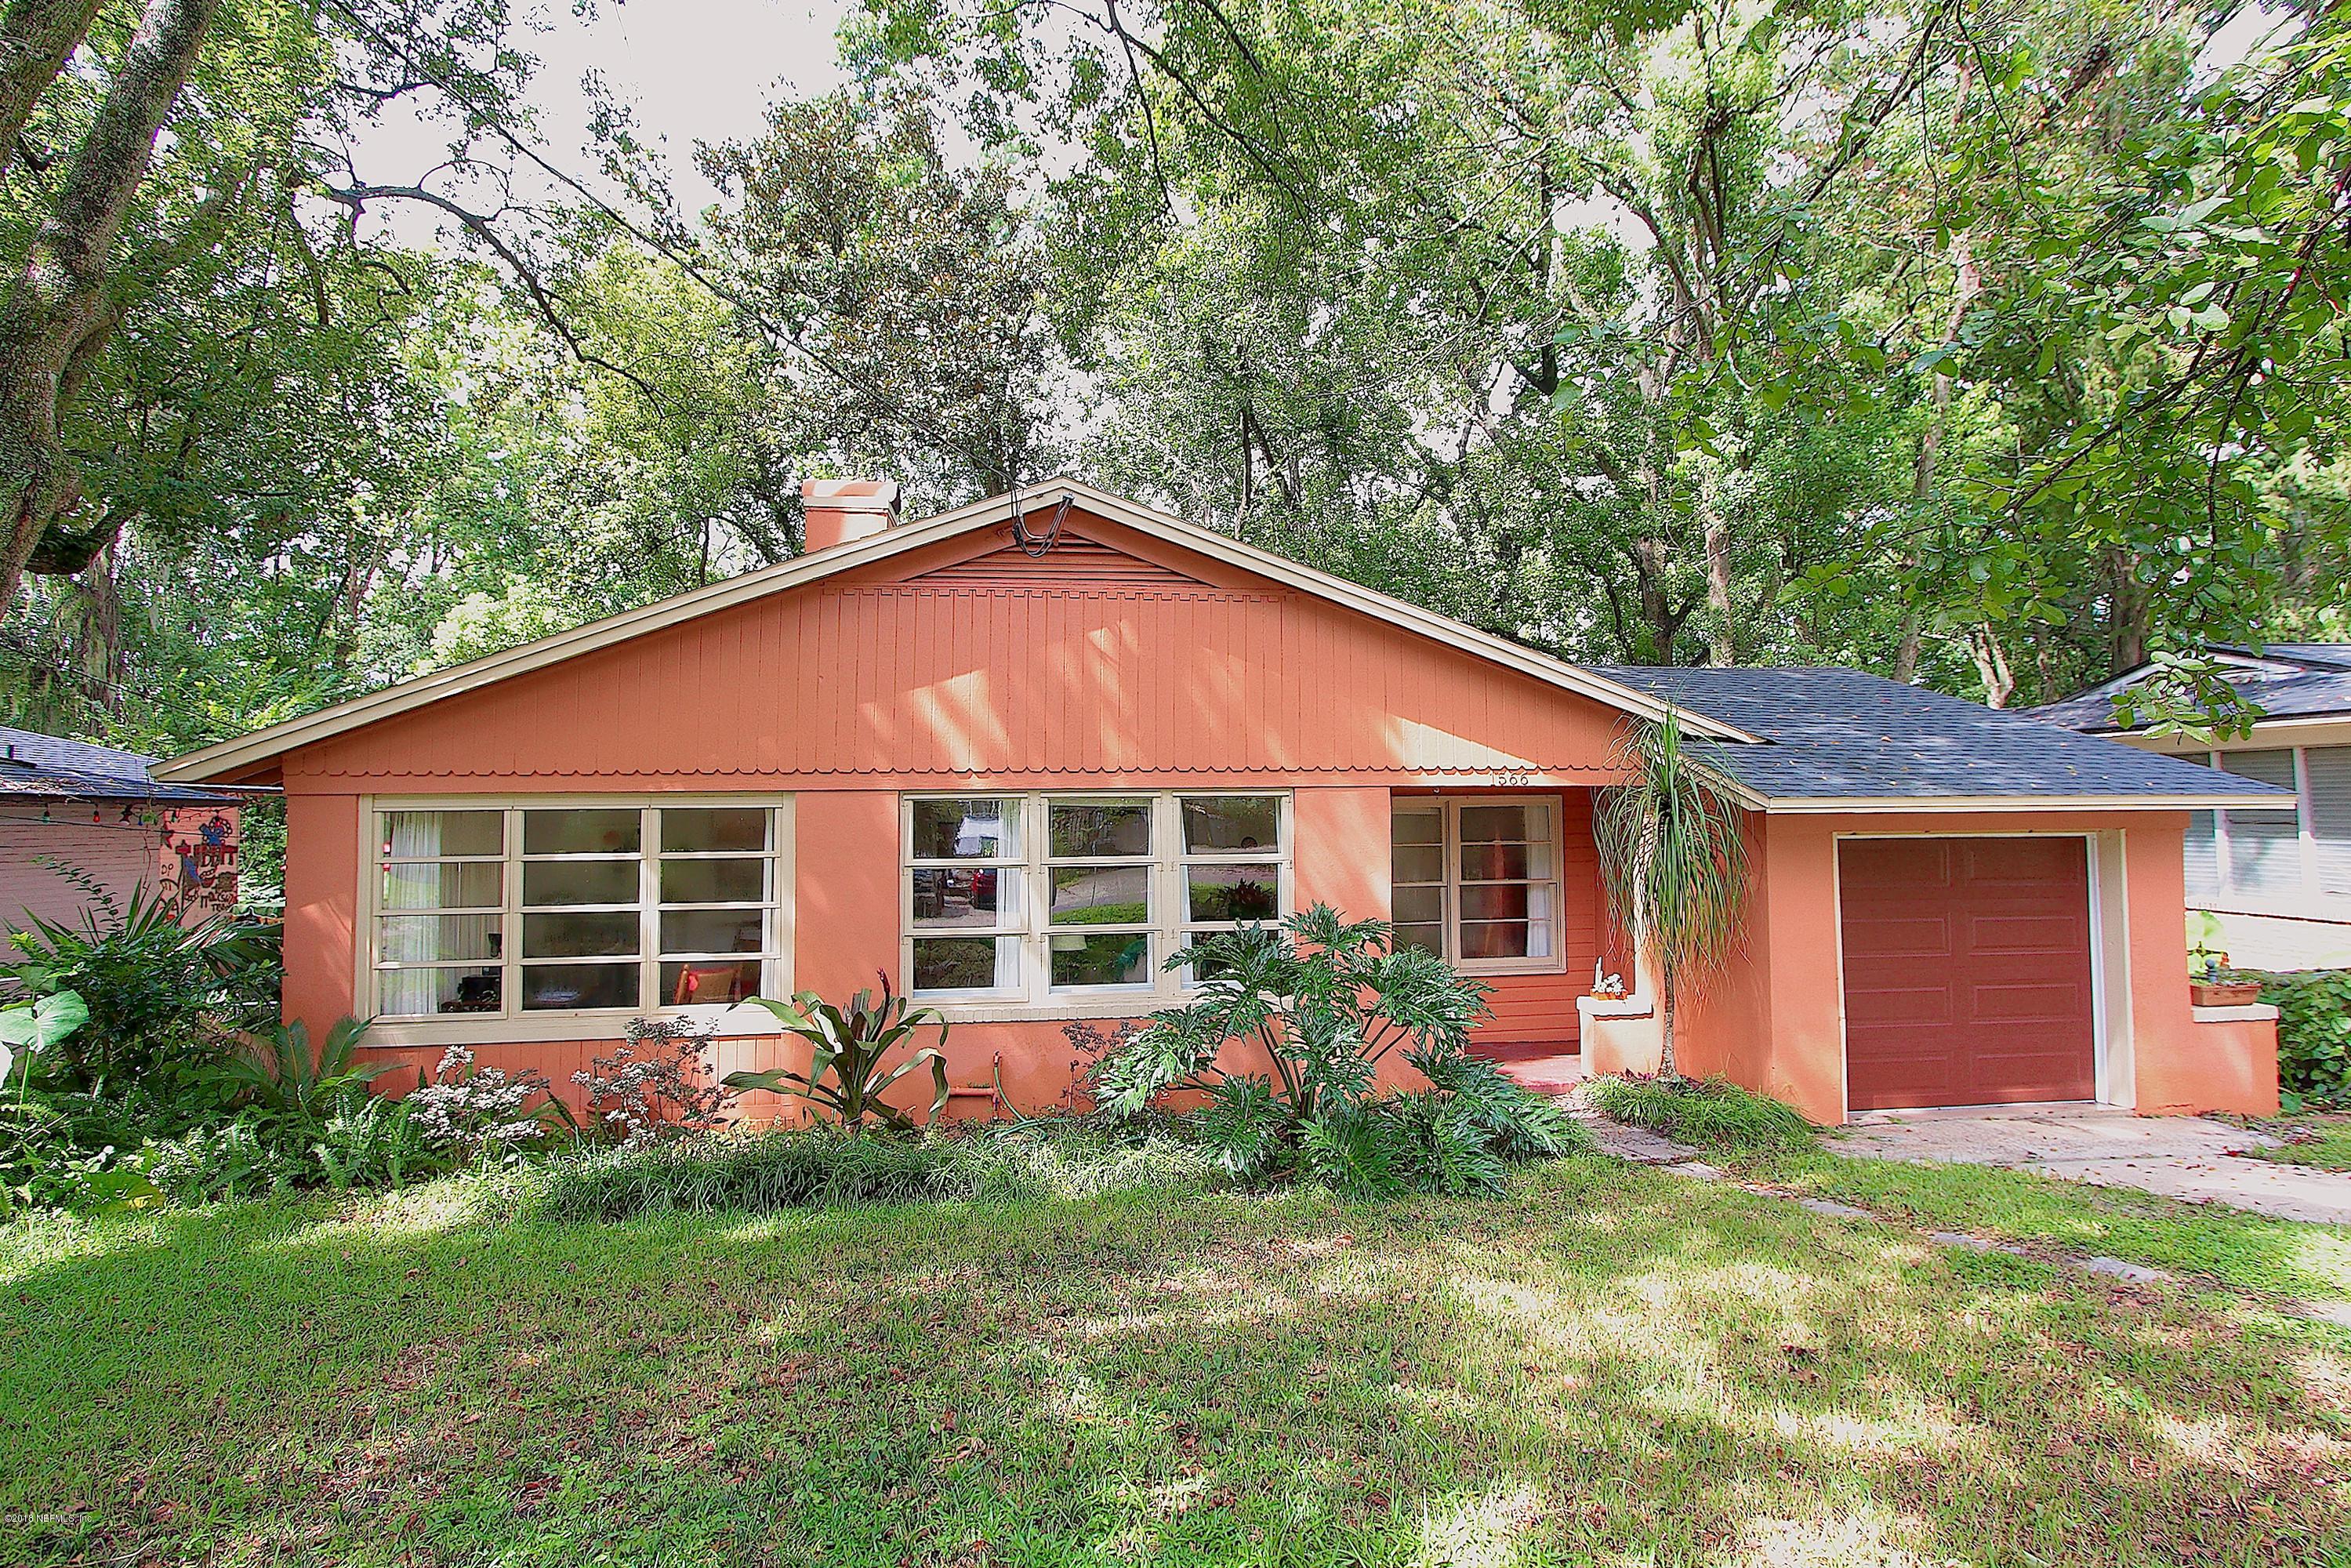 1566 GERALDINE, JACKSONVILLE, FLORIDA 32205, 3 Bedrooms Bedrooms, ,1 BathroomBathrooms,Residential - single family,For sale,GERALDINE,954182